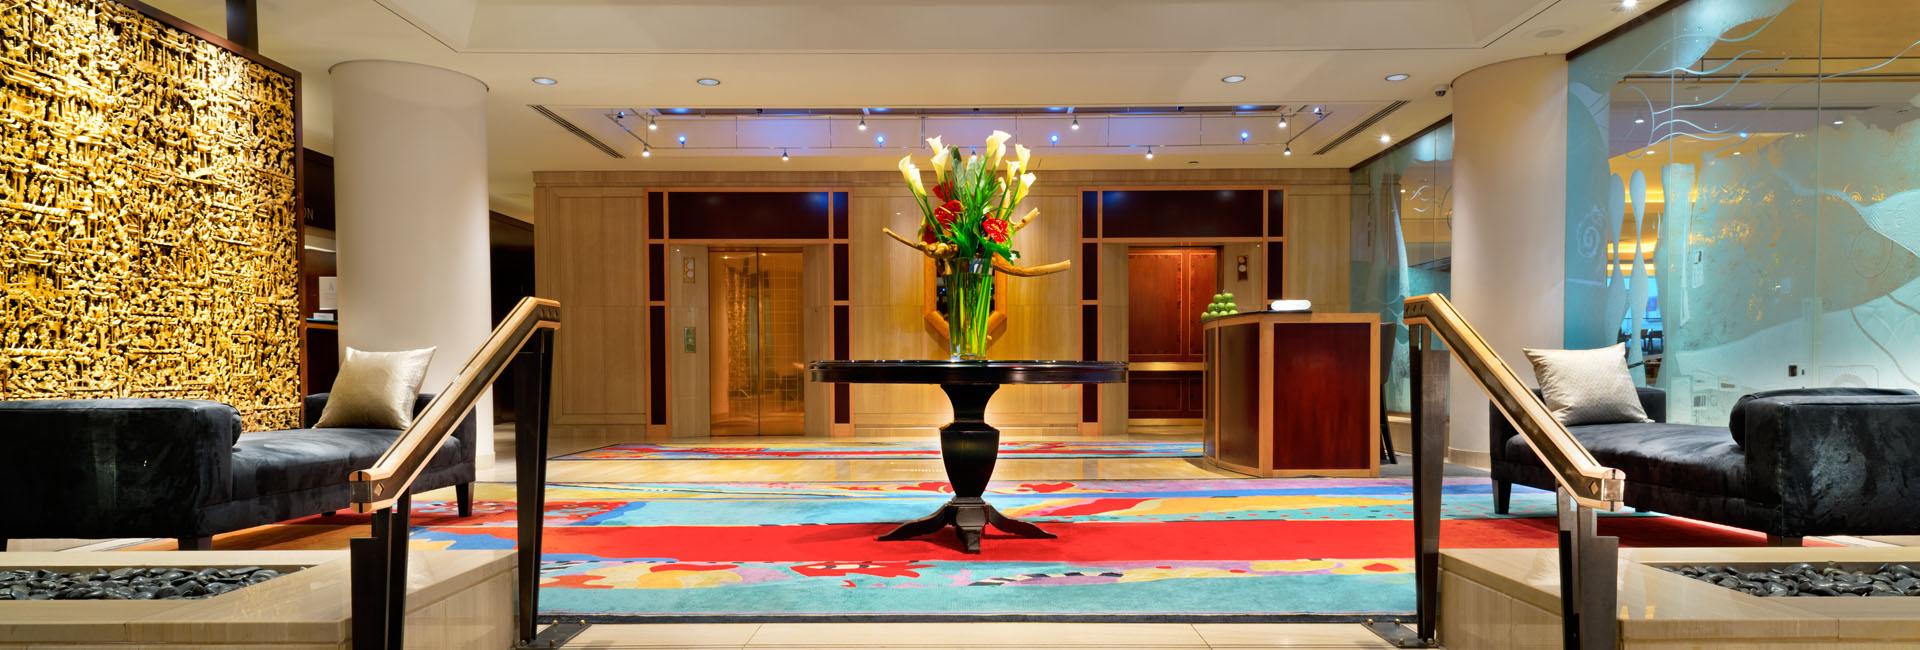 Downtown vancouver hotel metropolitan hotel vancouver for Best boutique hotels vancouver bc